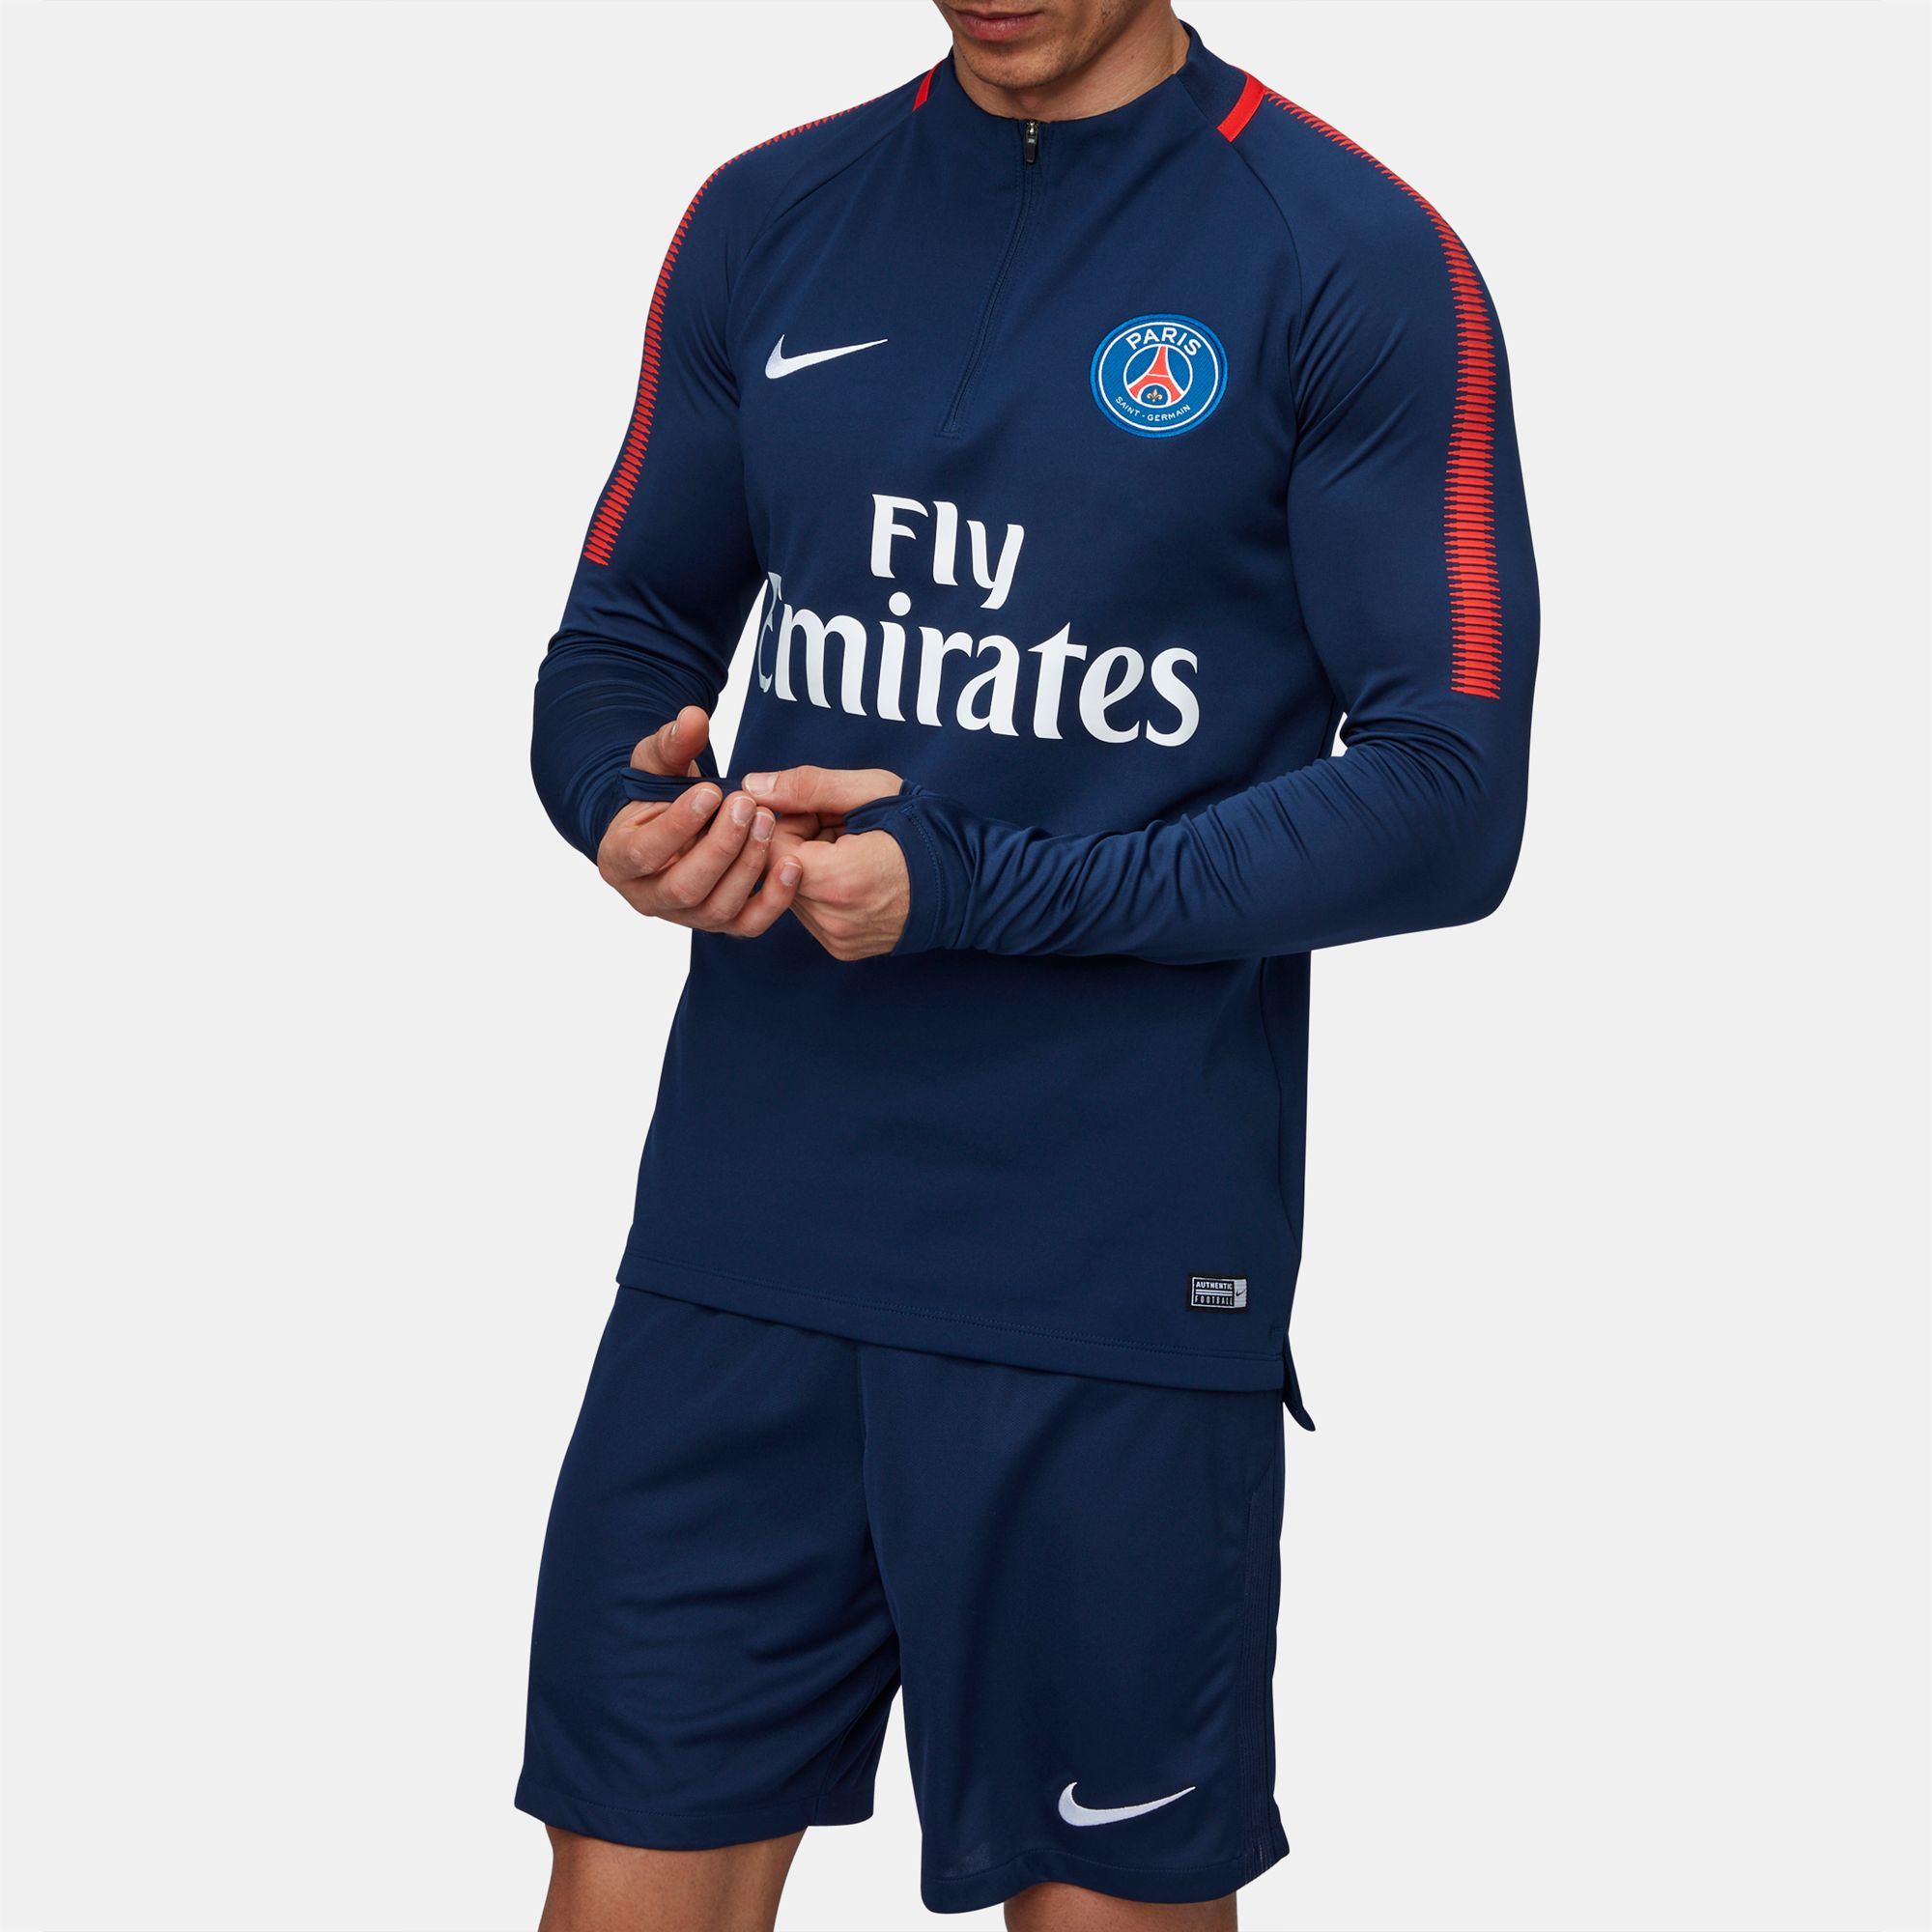 42a596c89 Shop Blue Nike Paris Saint-Germain Dri-FIT Squad Drill Long Sleeve T ...